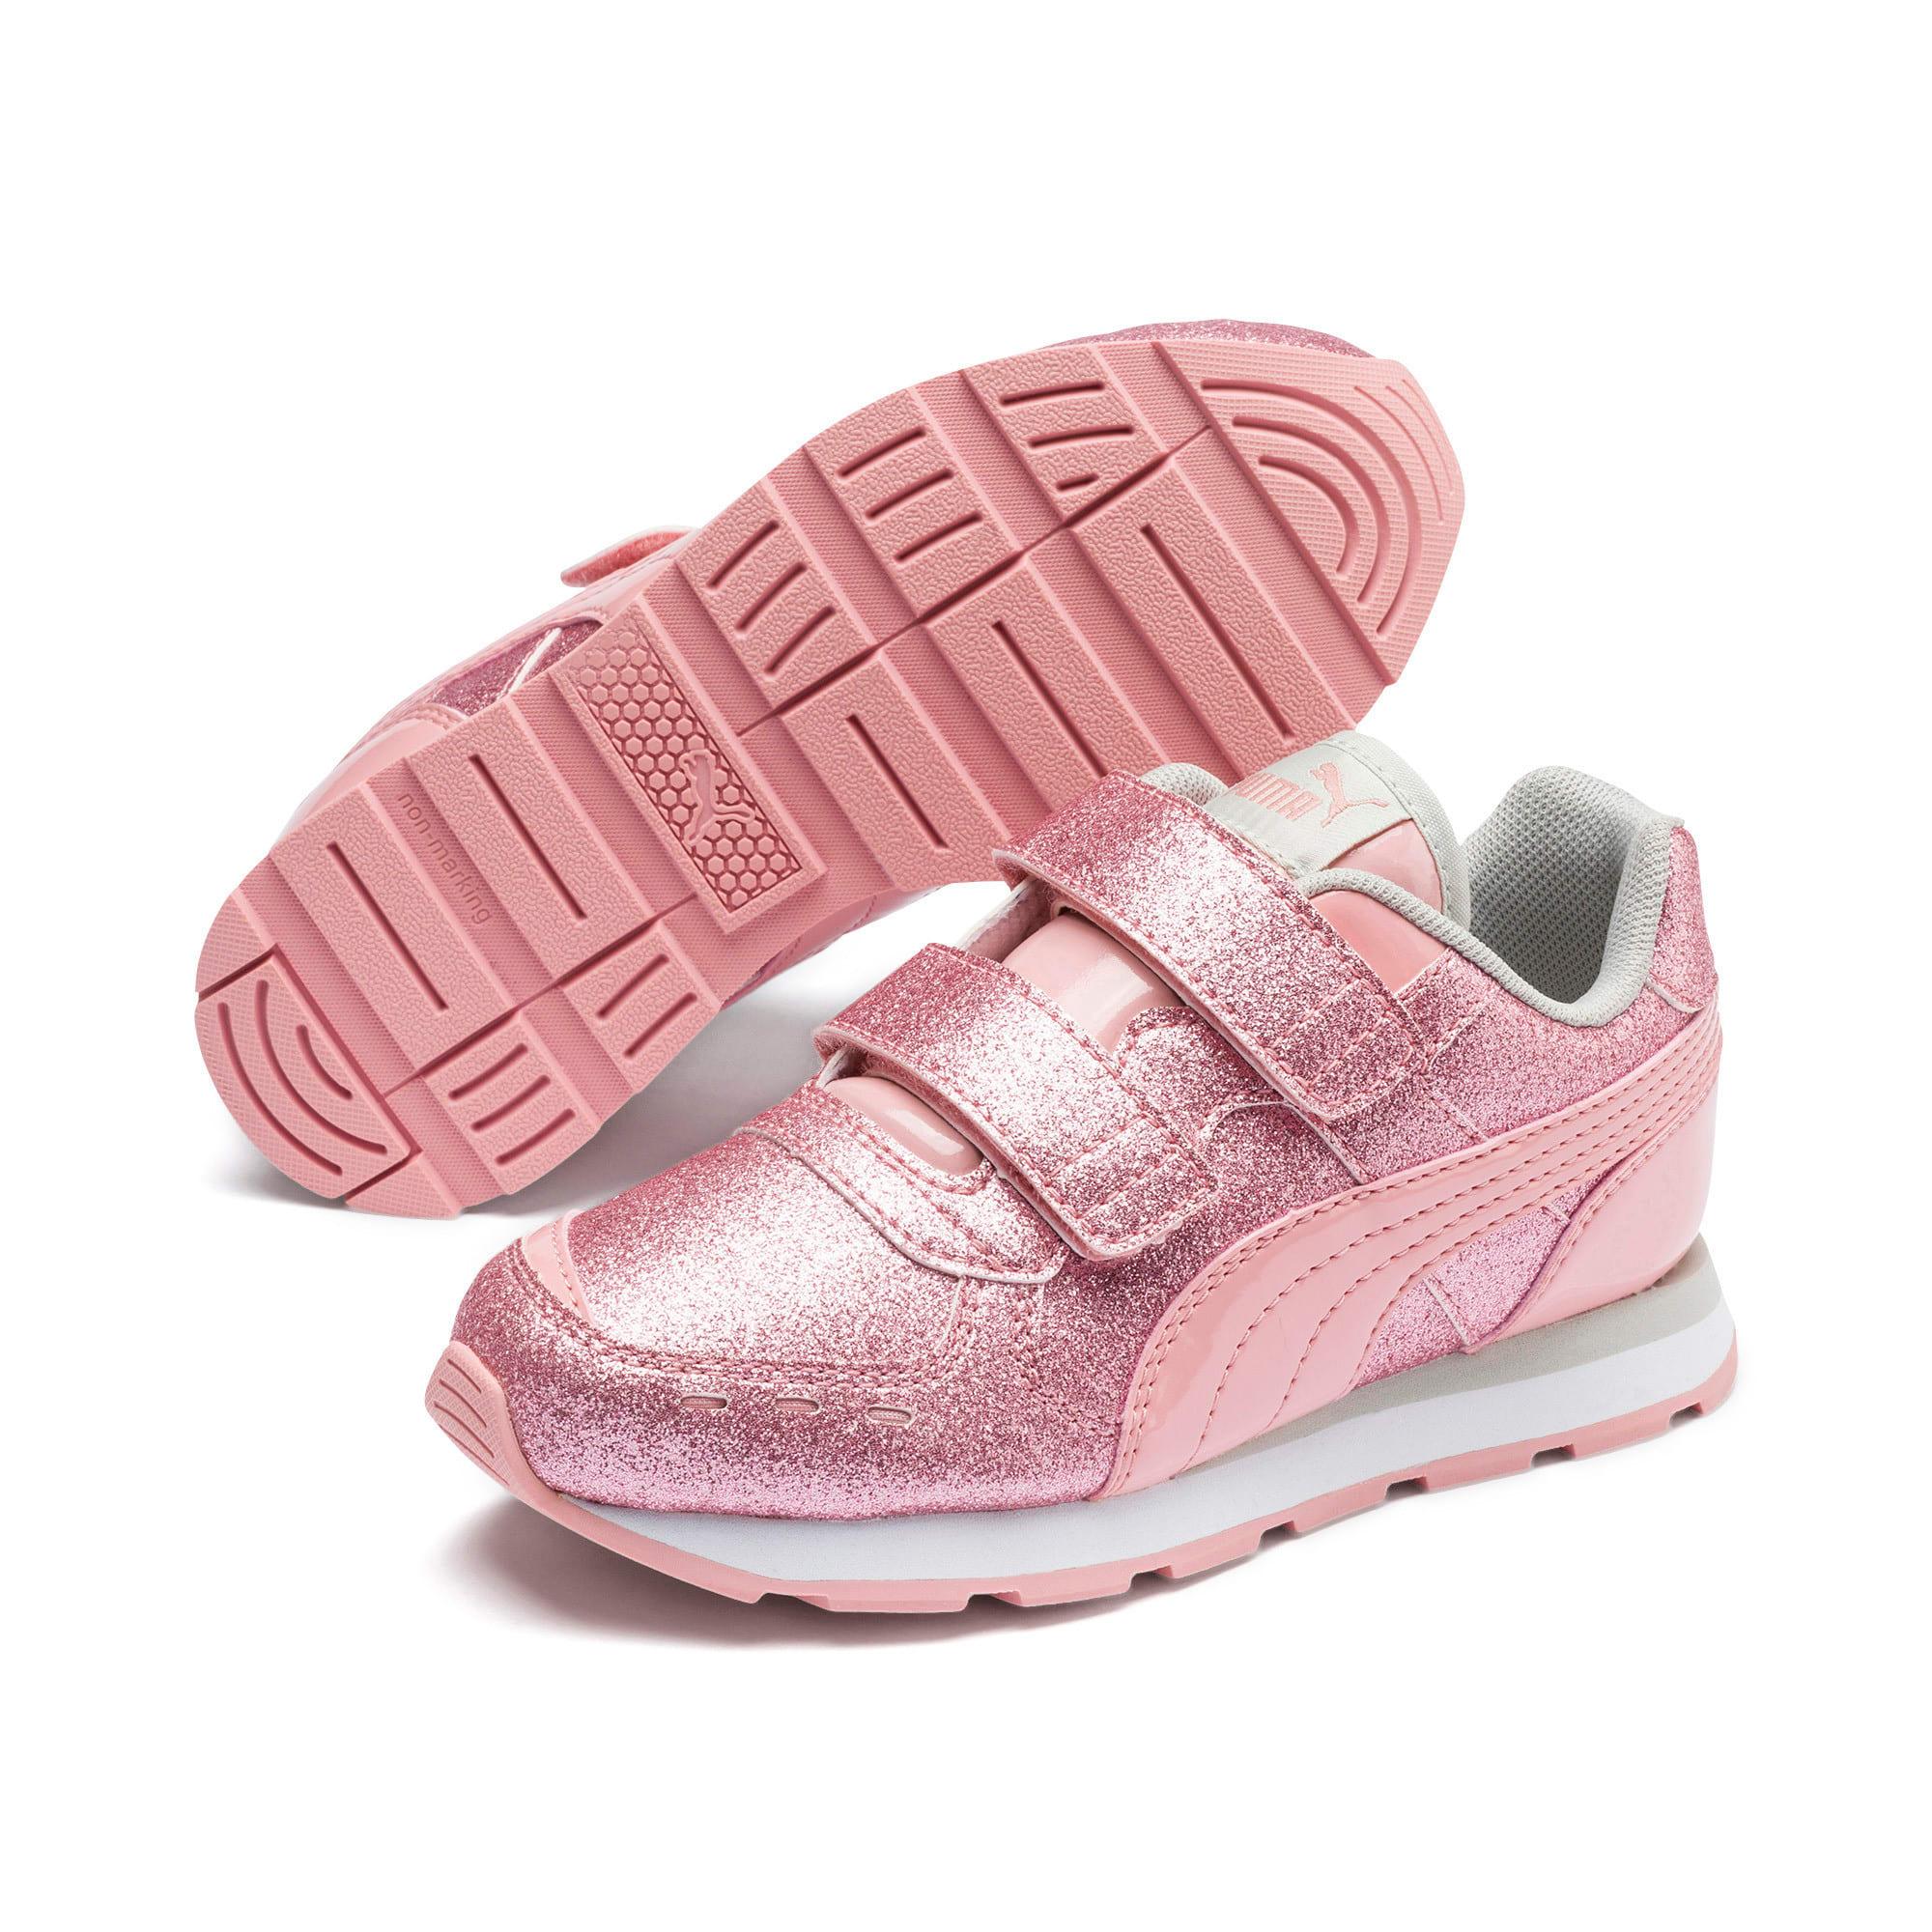 Miniatura 2 de Zapatos Vista Glitz para niña pequeña, Bridal Rose-Gray Violet, mediano